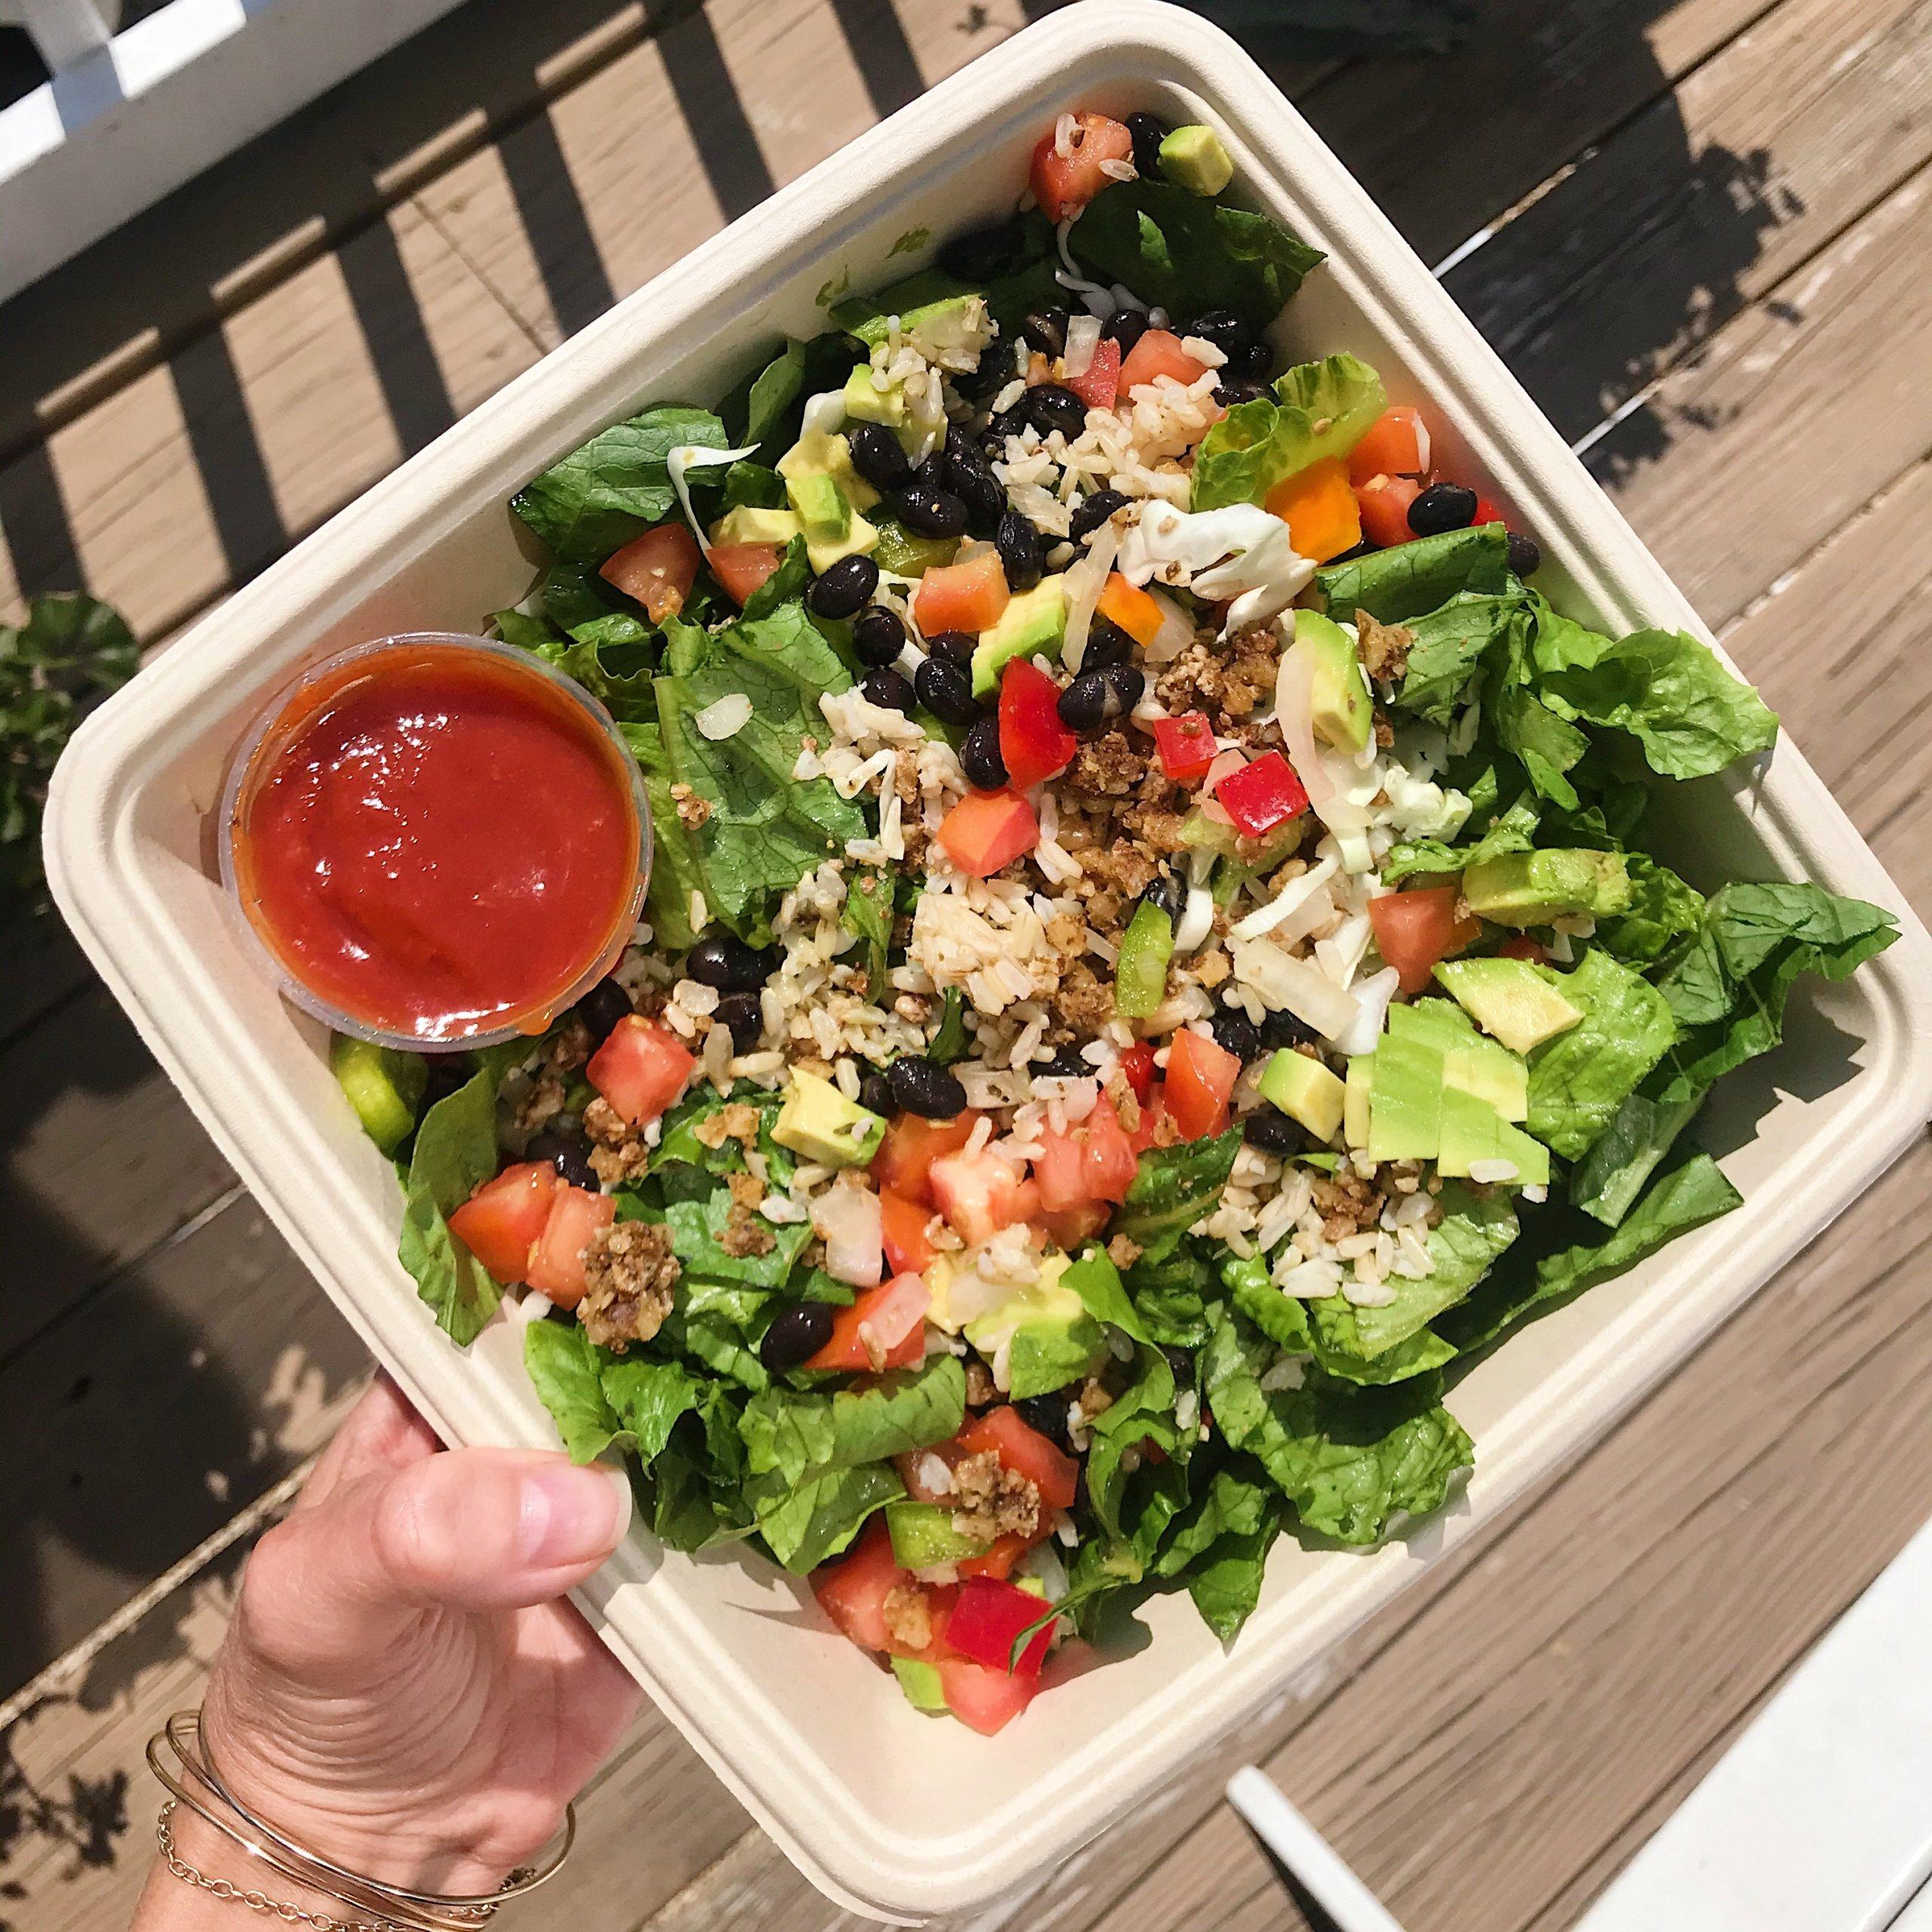 Southwestern Chopped Salad gluten free #glutenfree #glutenfreerecipes www.healthygffamily.com